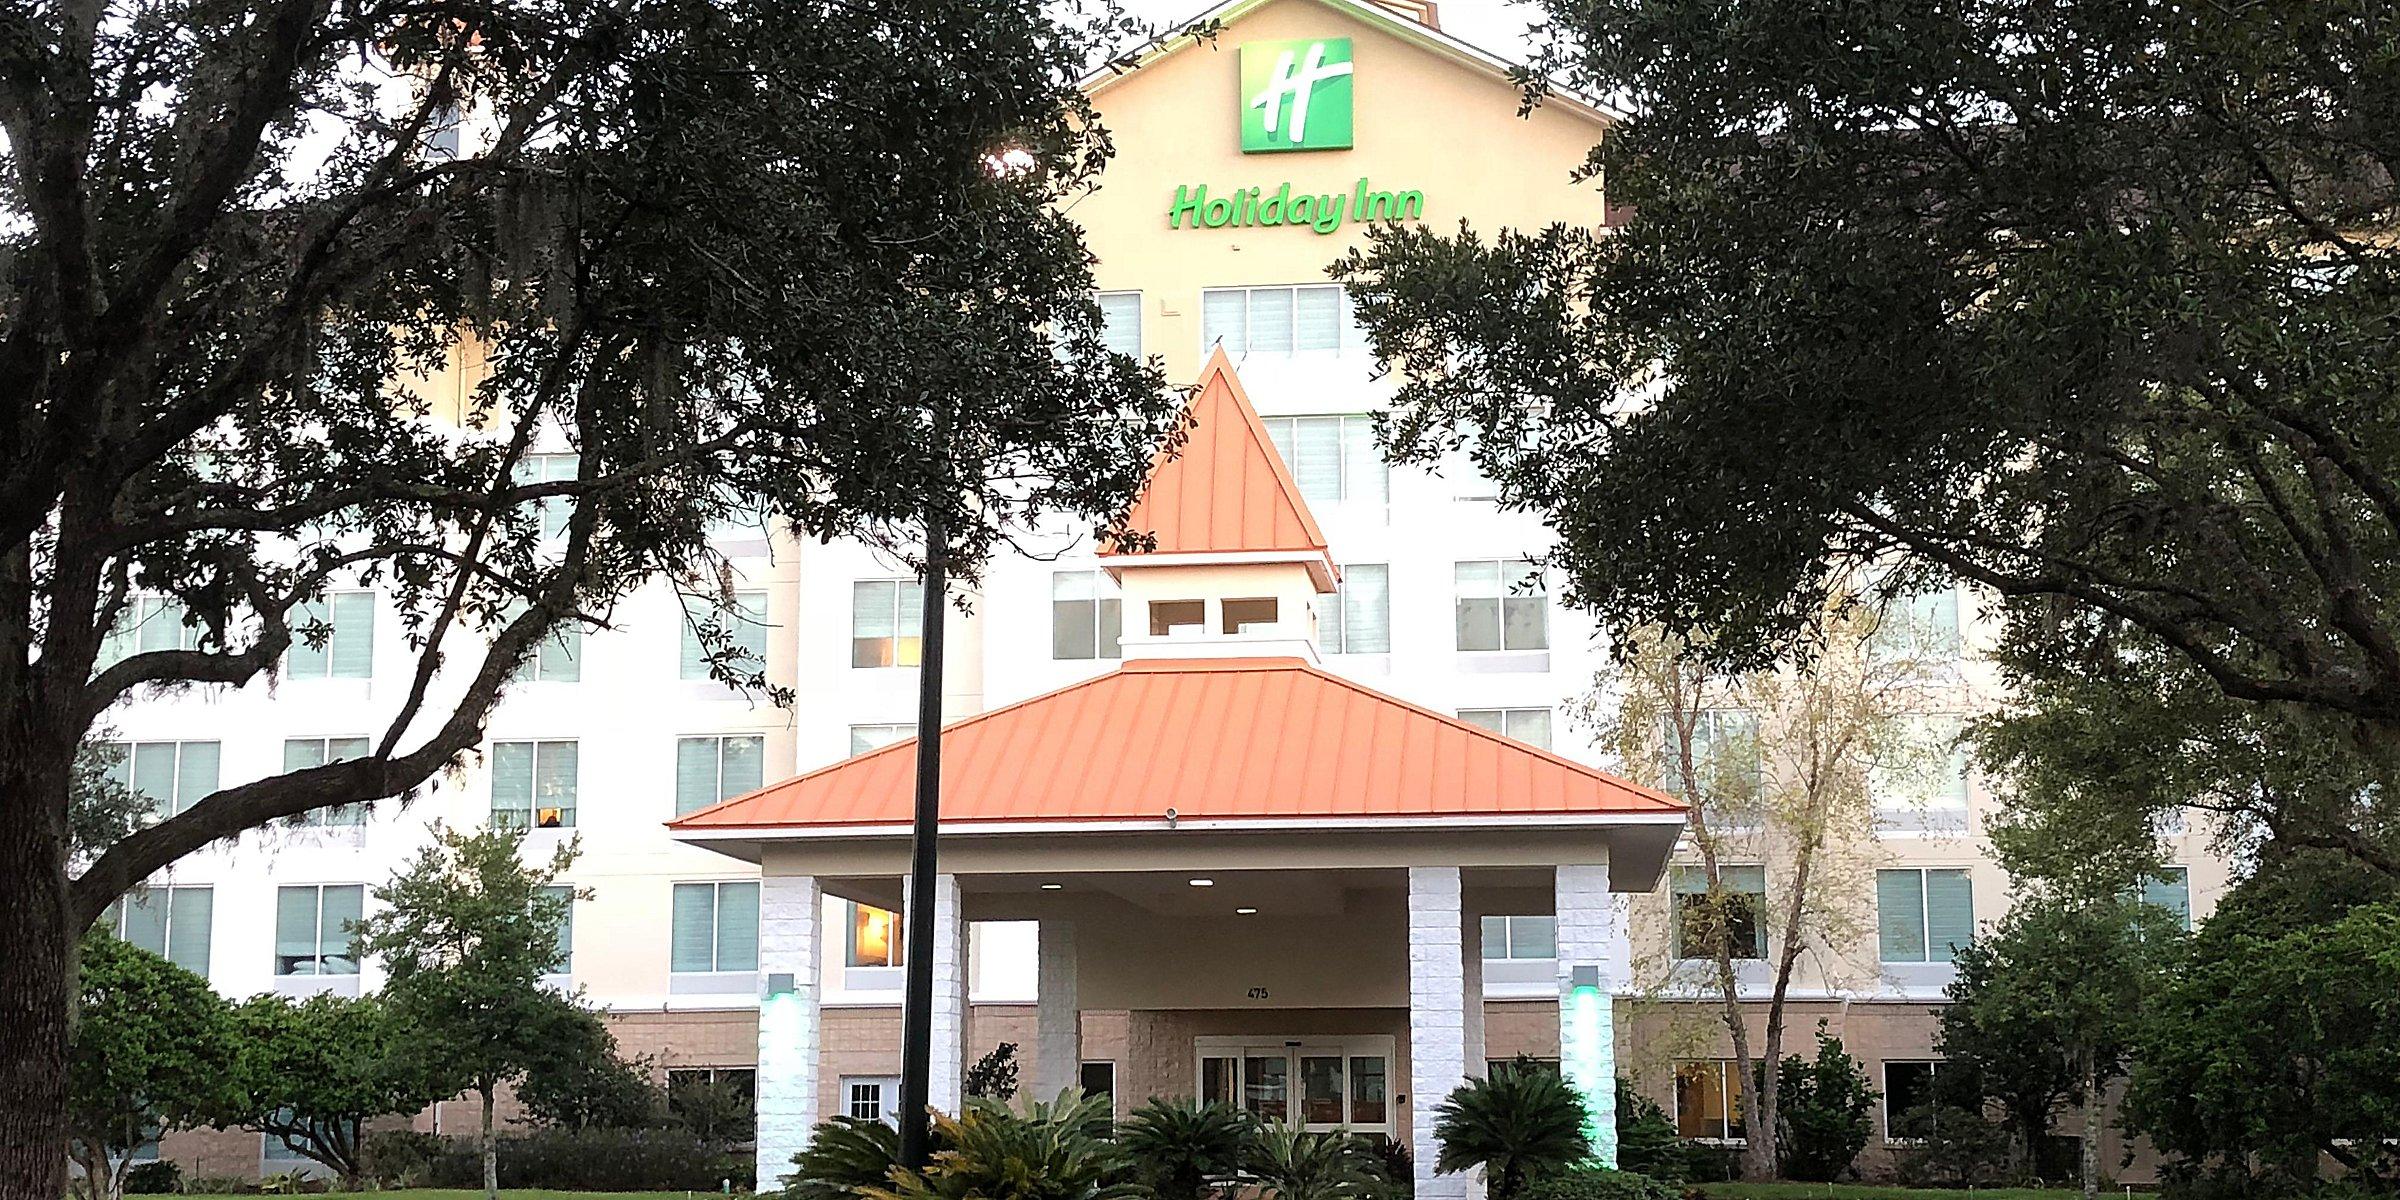 Holiday Inn St Augustine - World Golf Hotel by IHG